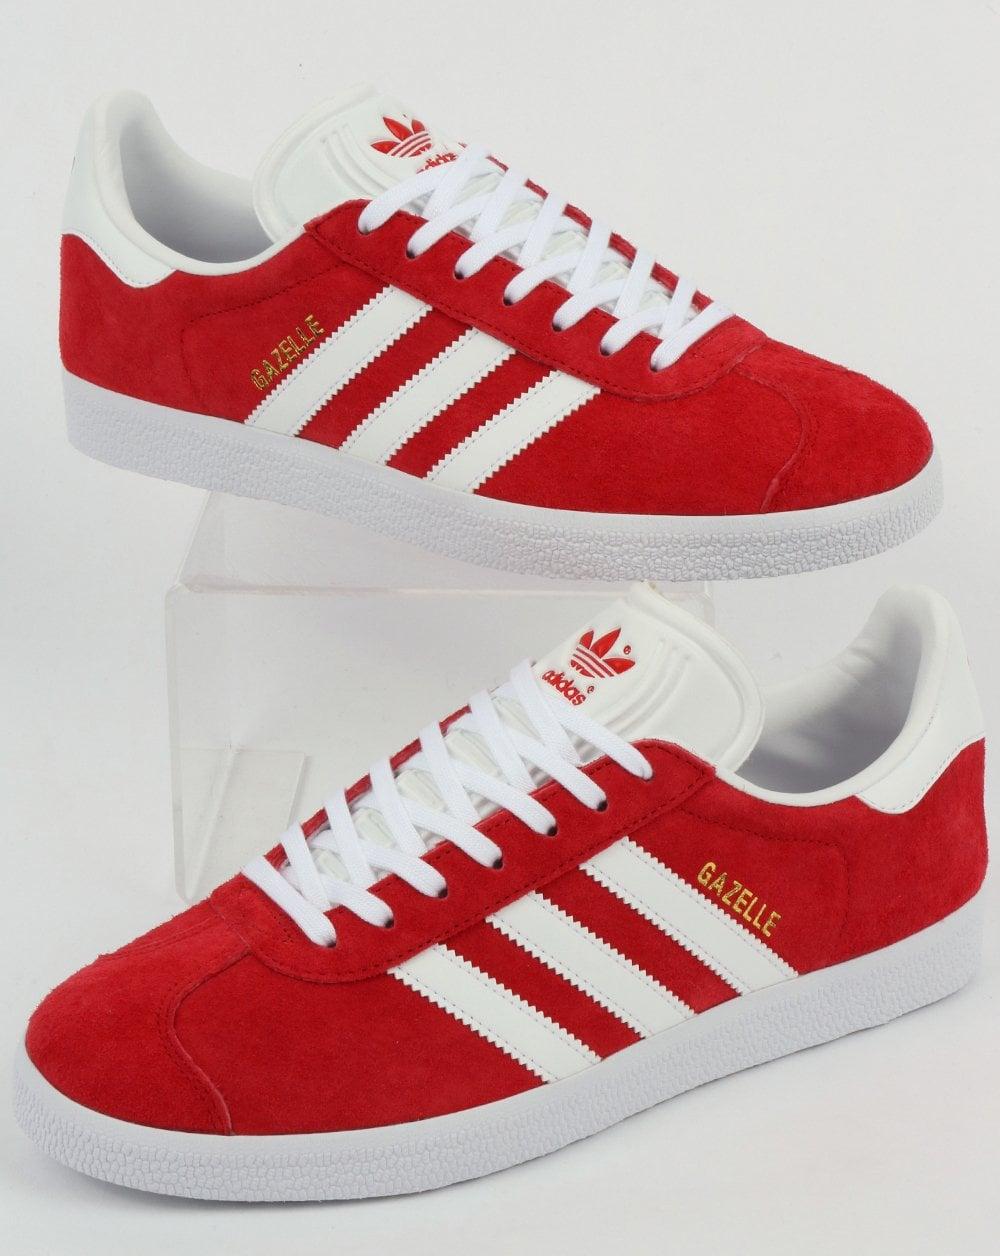 Adidas Gazelle Trainers RedWhite